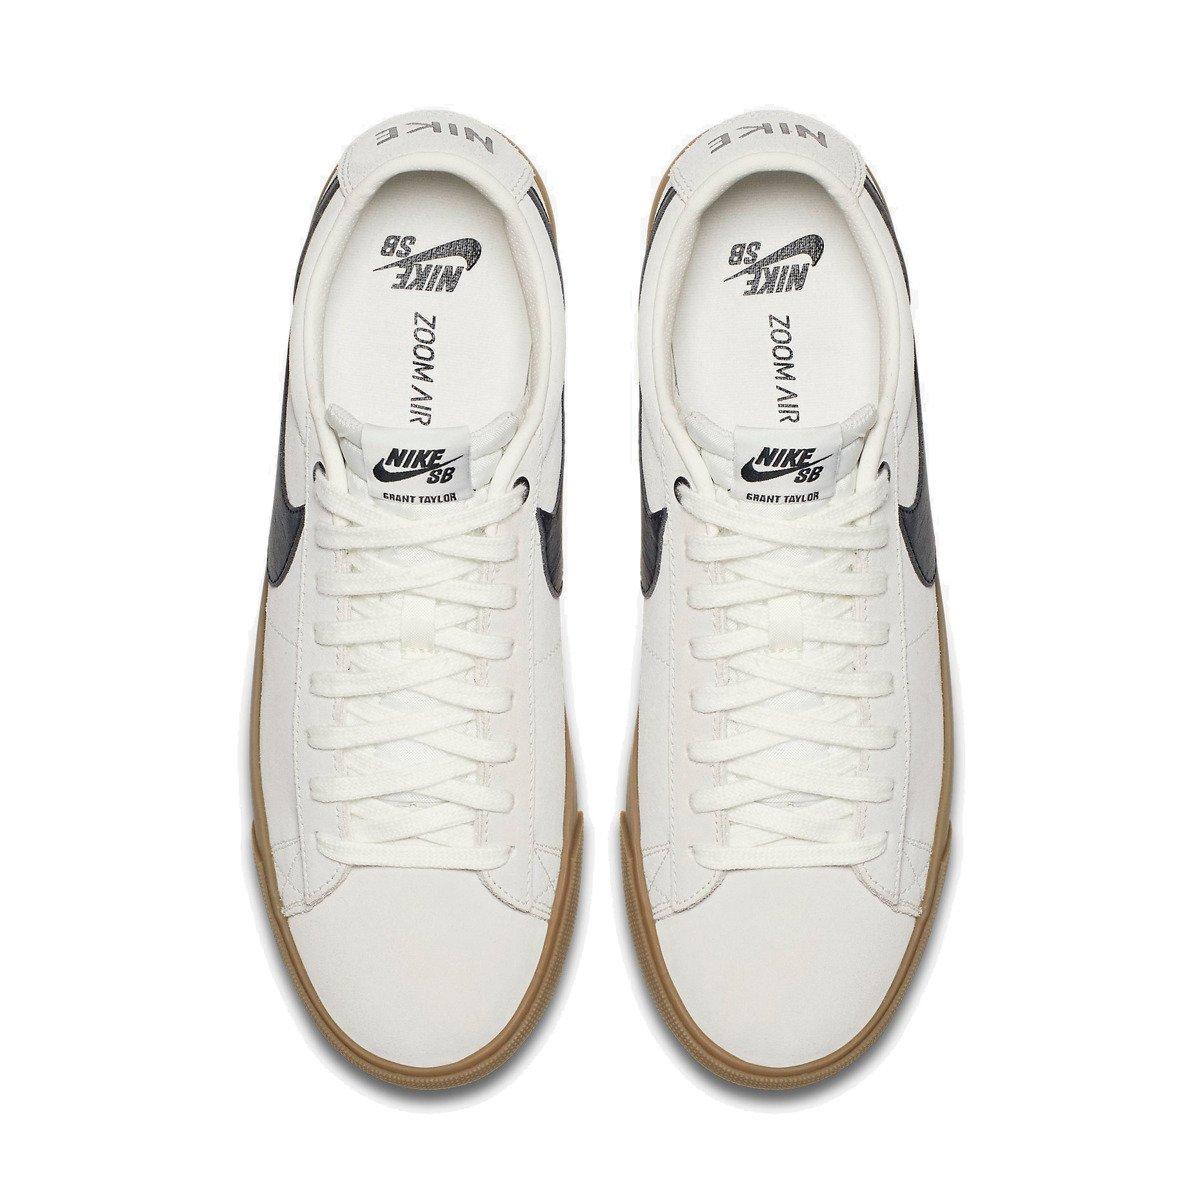 quality design 227de 7c834 ... Buty Nike SB Blazer Low GT Ivoryblack-gum Light Brown Click to zoom ...